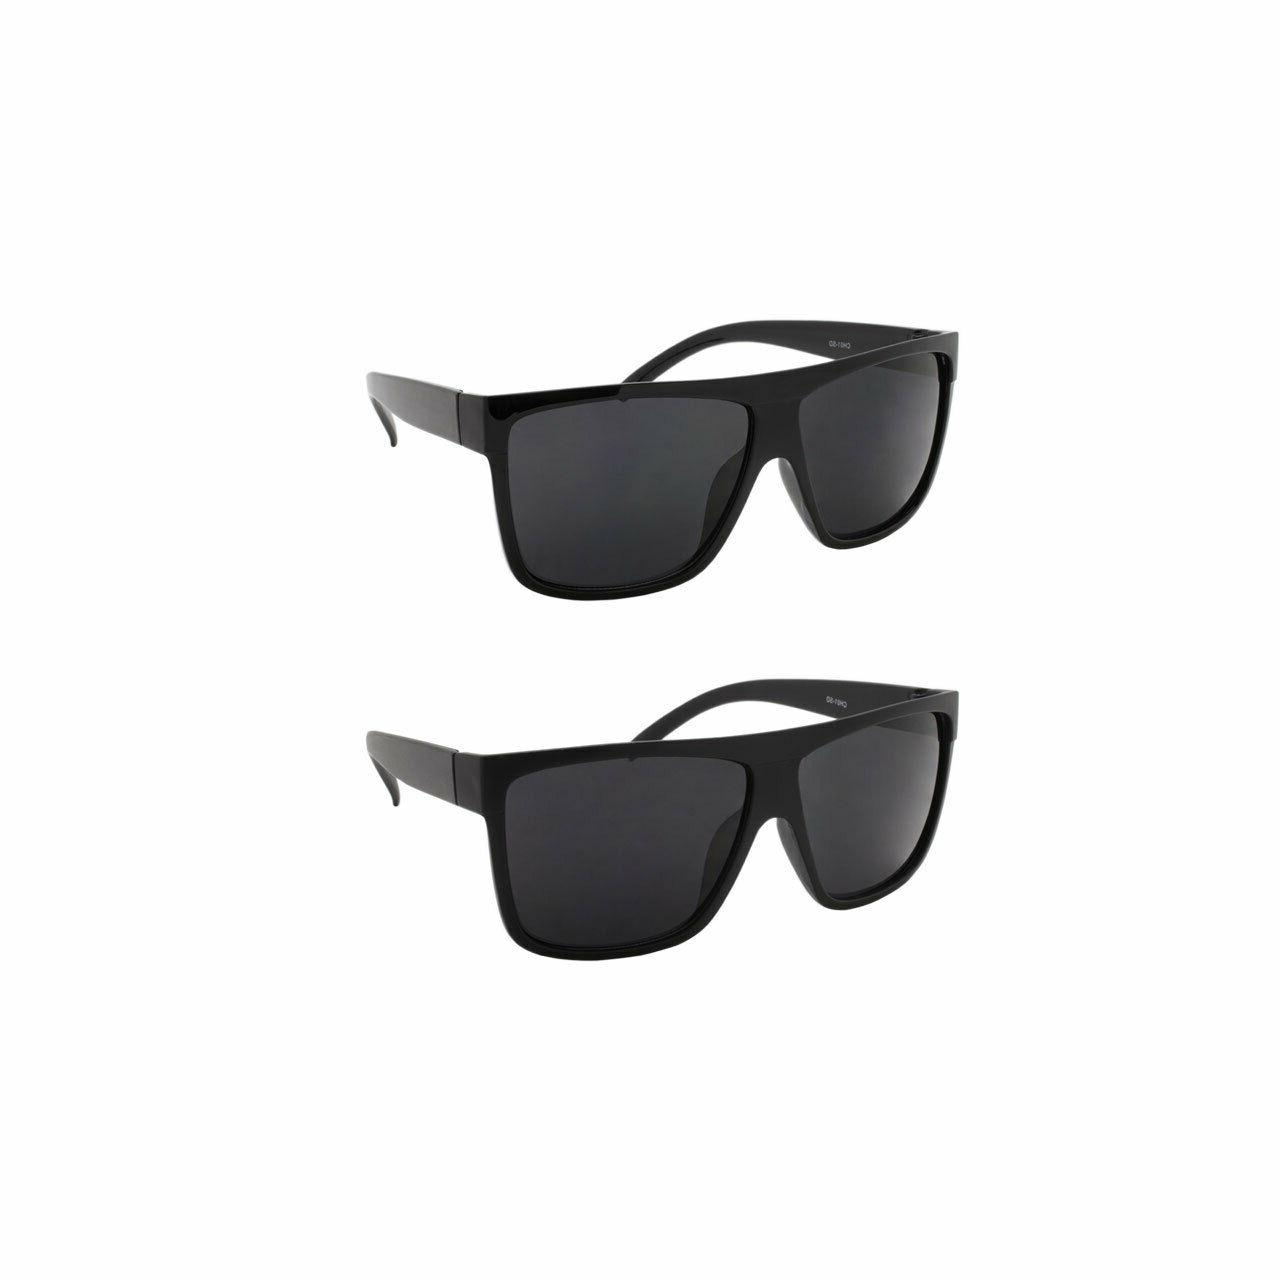 OG Sunglasses Top Style Sunglass Style